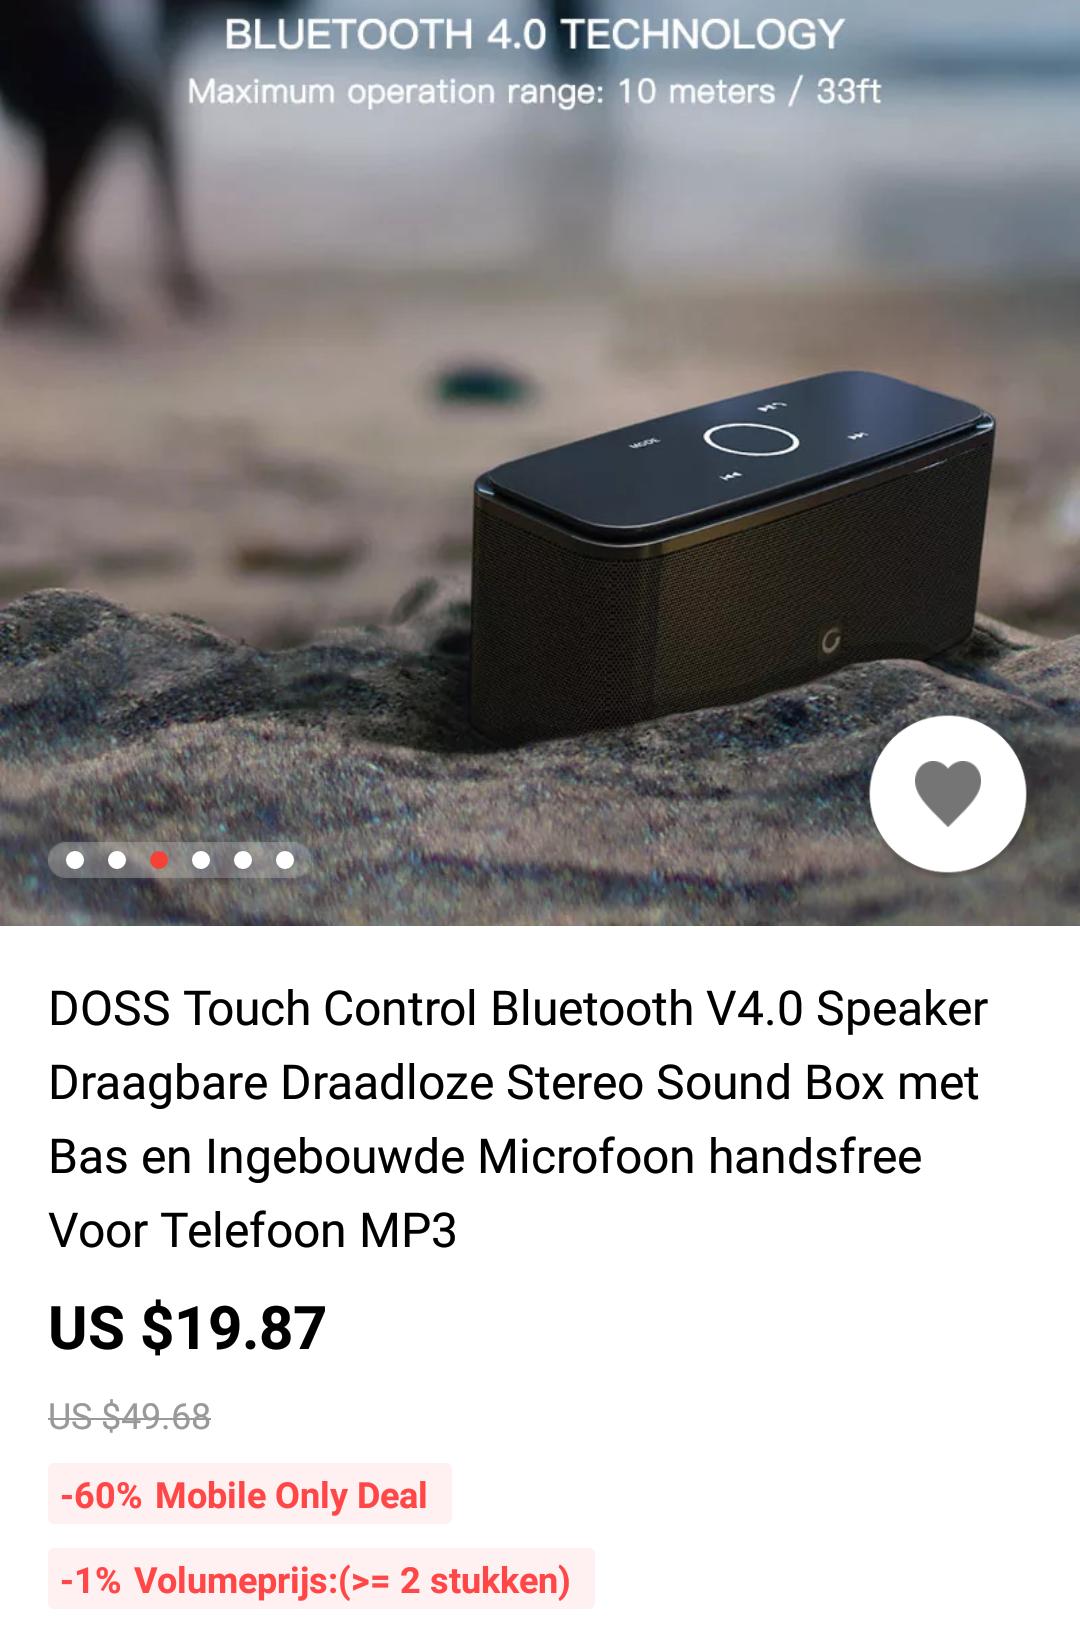 Aliexpress DOSS Touch Control Bluetooth V4.0 Speaker Draagbare Draadloze Stereo Sound Box met Bas  je betaald net geen Invoerrechten